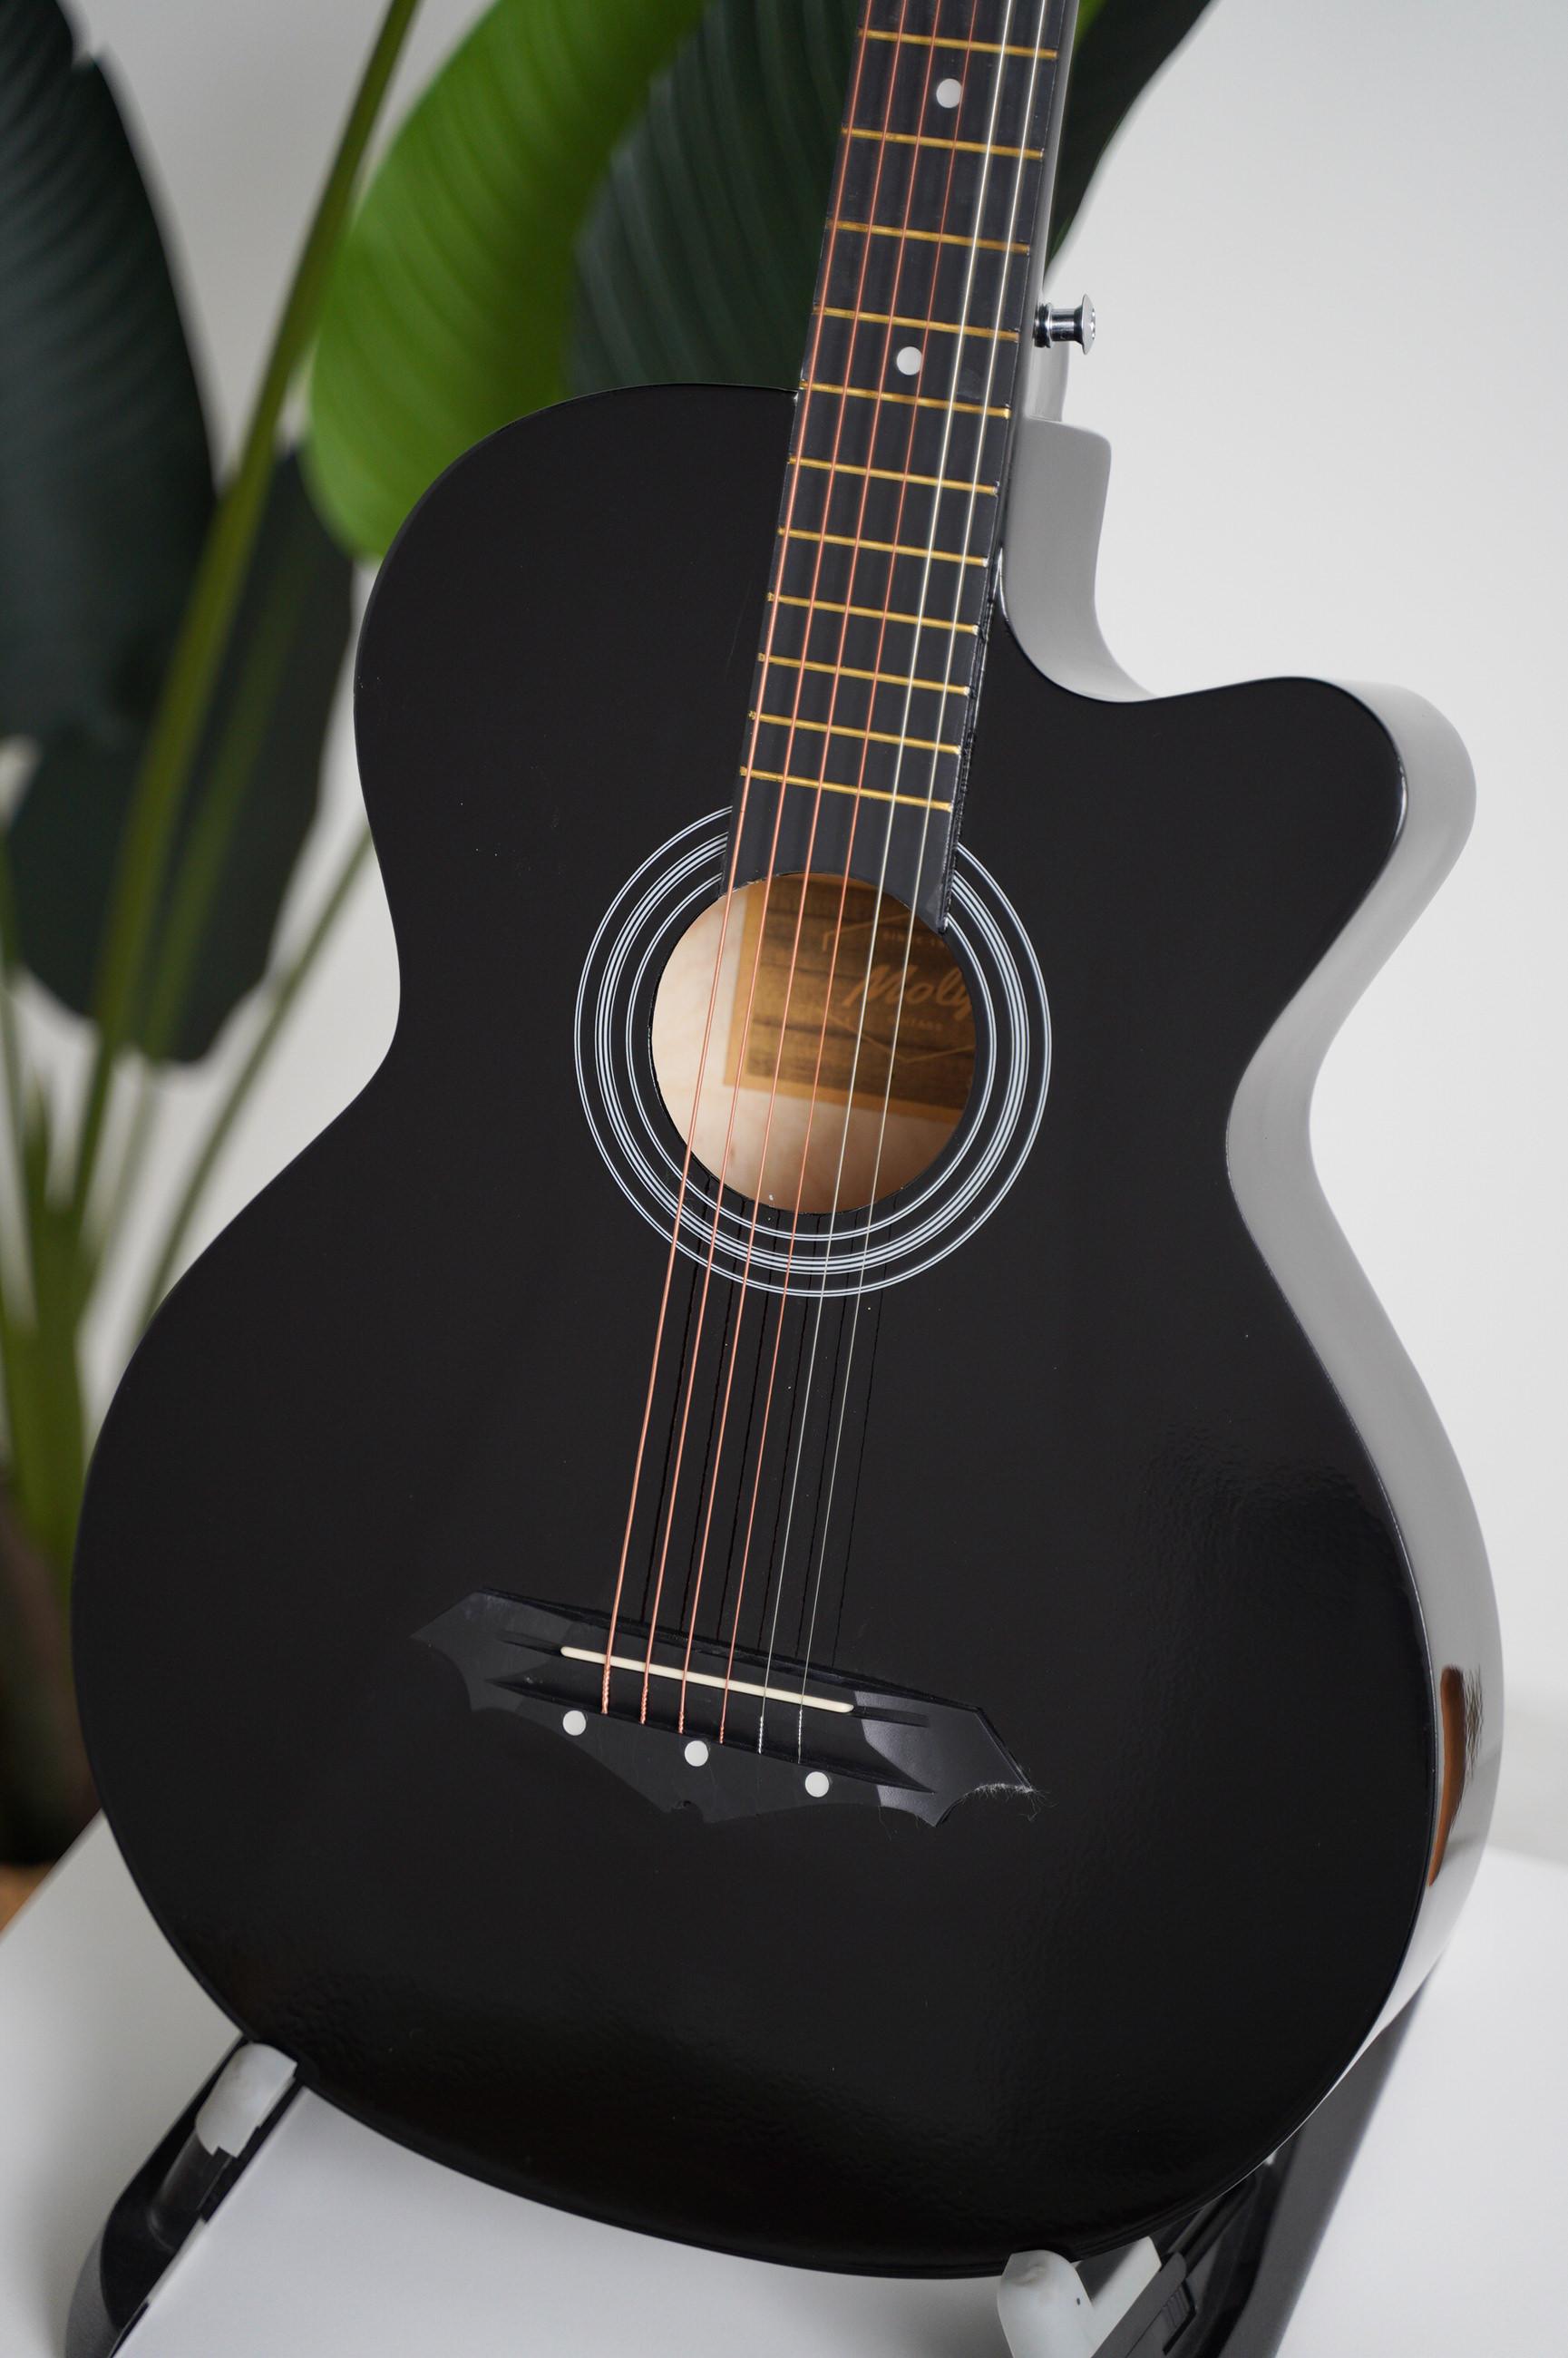 moly-ag-38-bk-acoustic-guitar-singapore-6.jpg